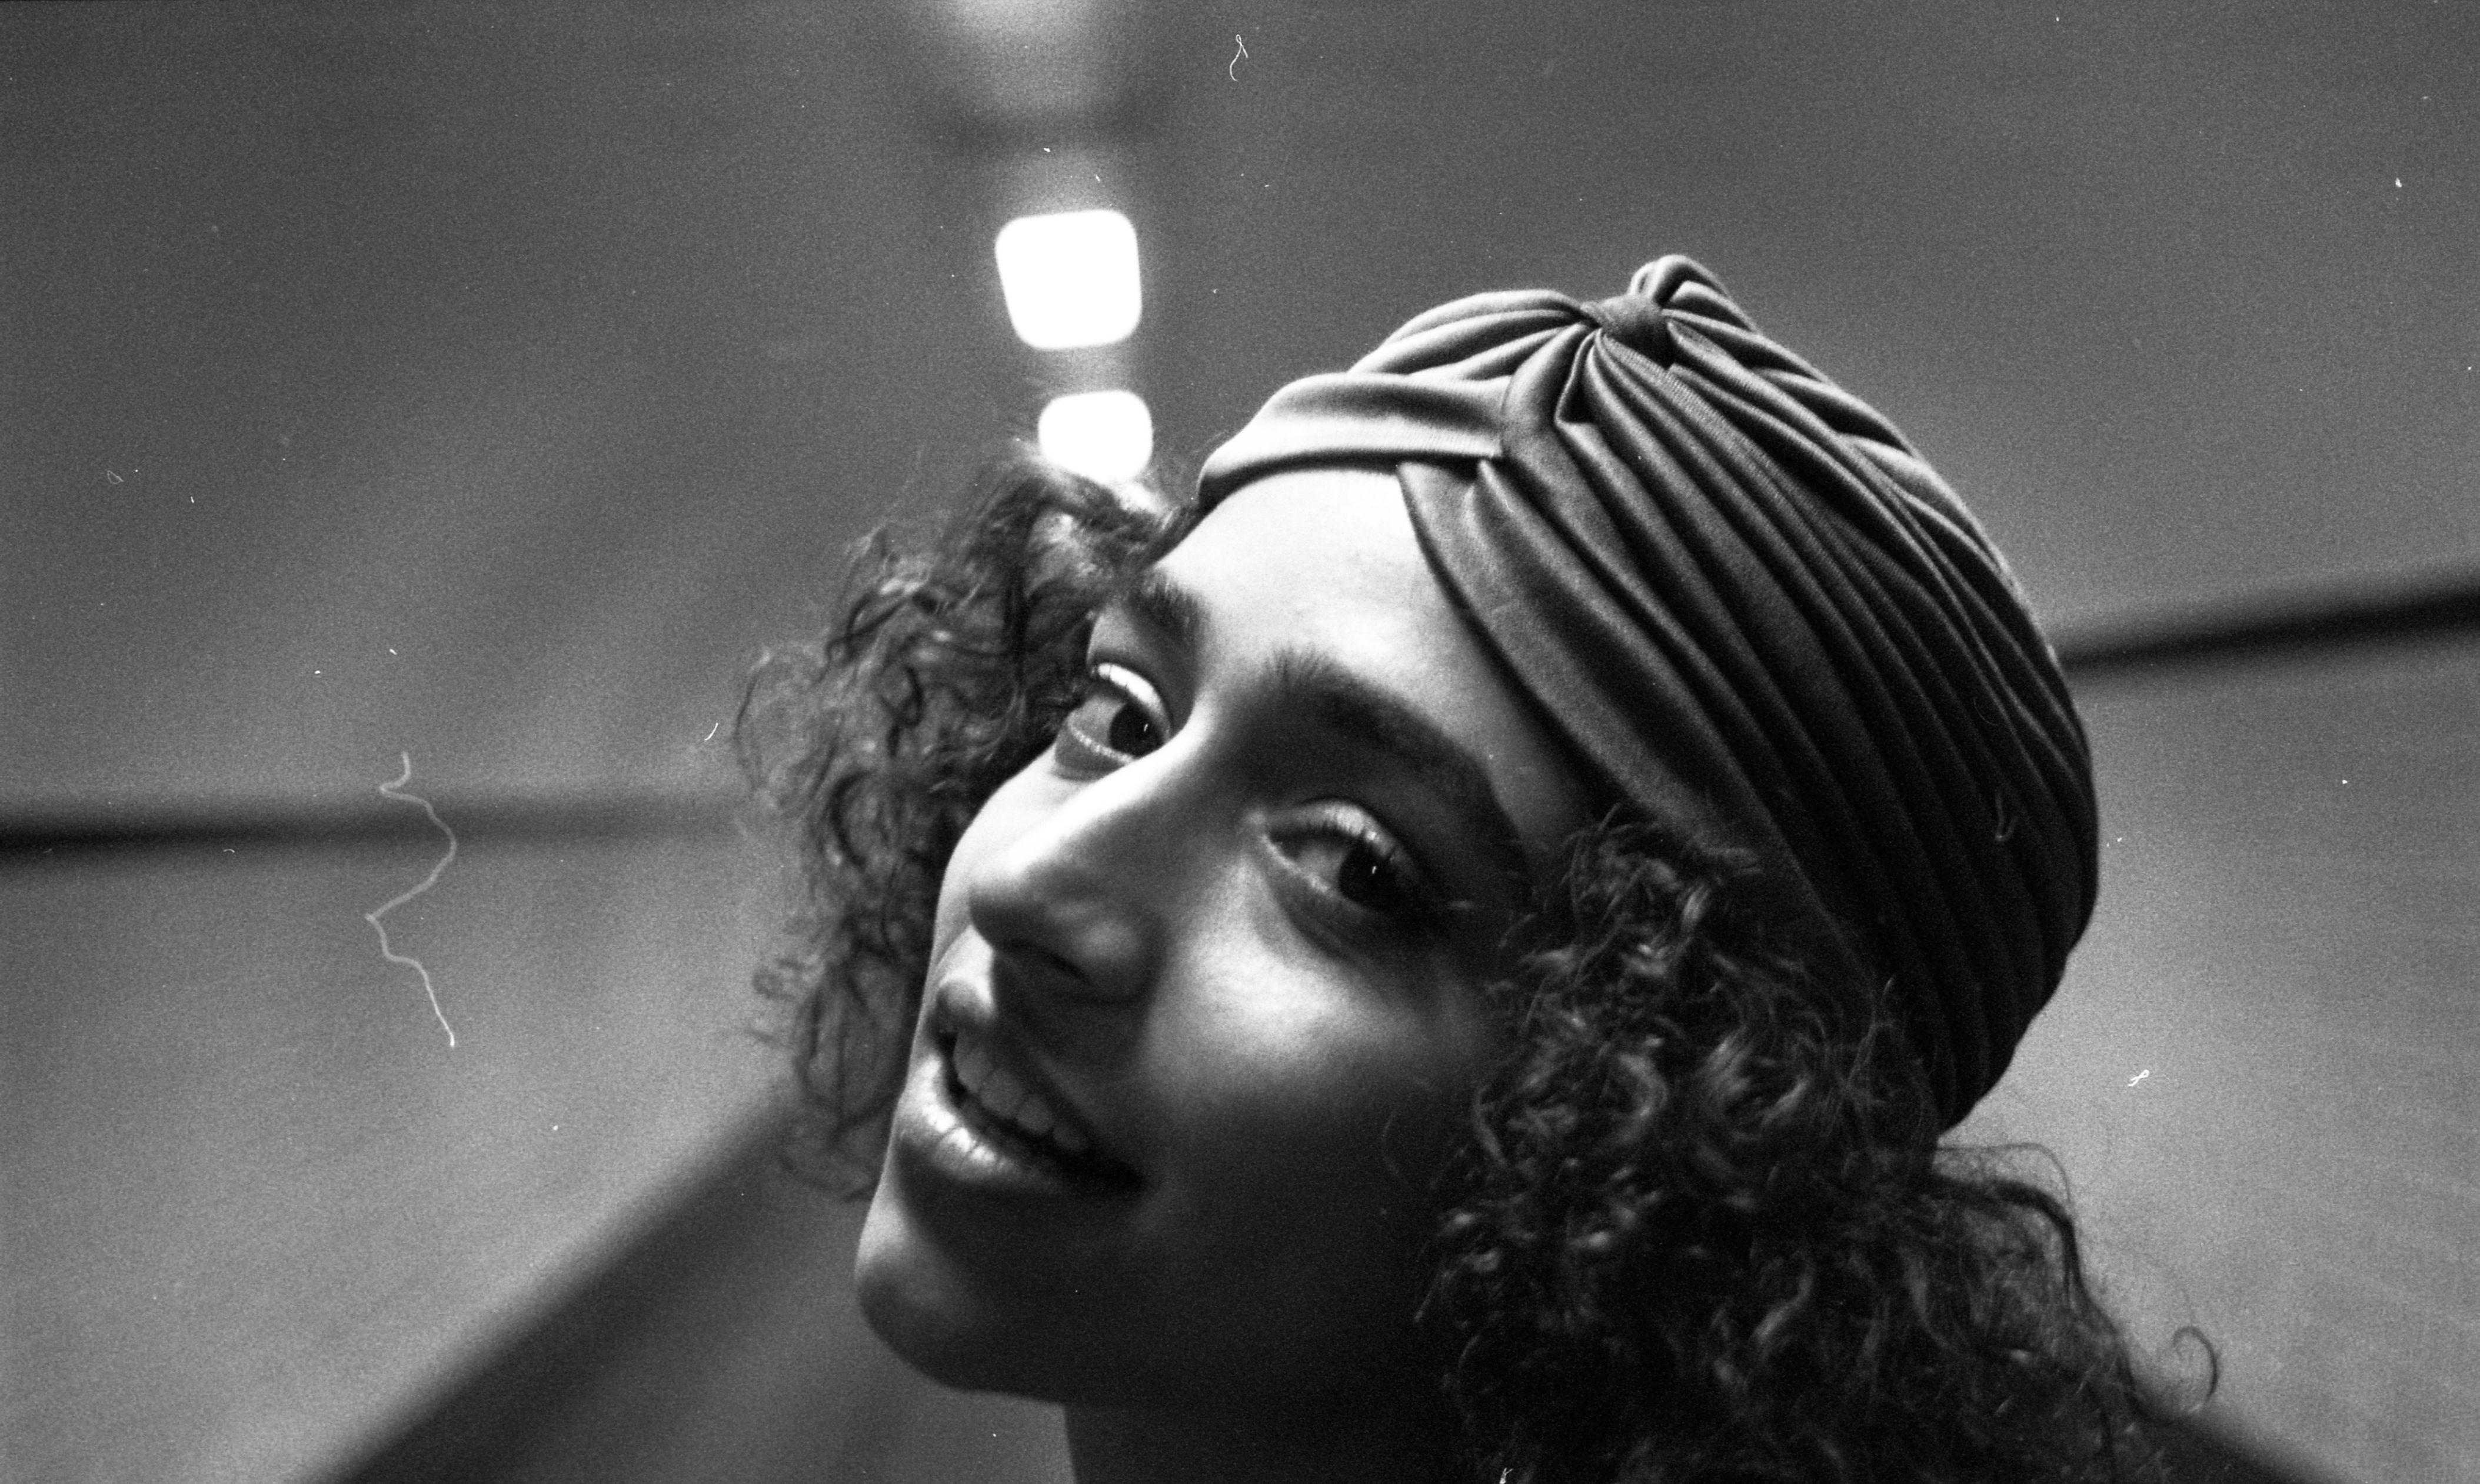 Blu Samu, Rap, Hiphop, singer, rapper, belgian, Portuguese, Brussels, Belgian, musicscene, moka, WBM, female artist, portrait